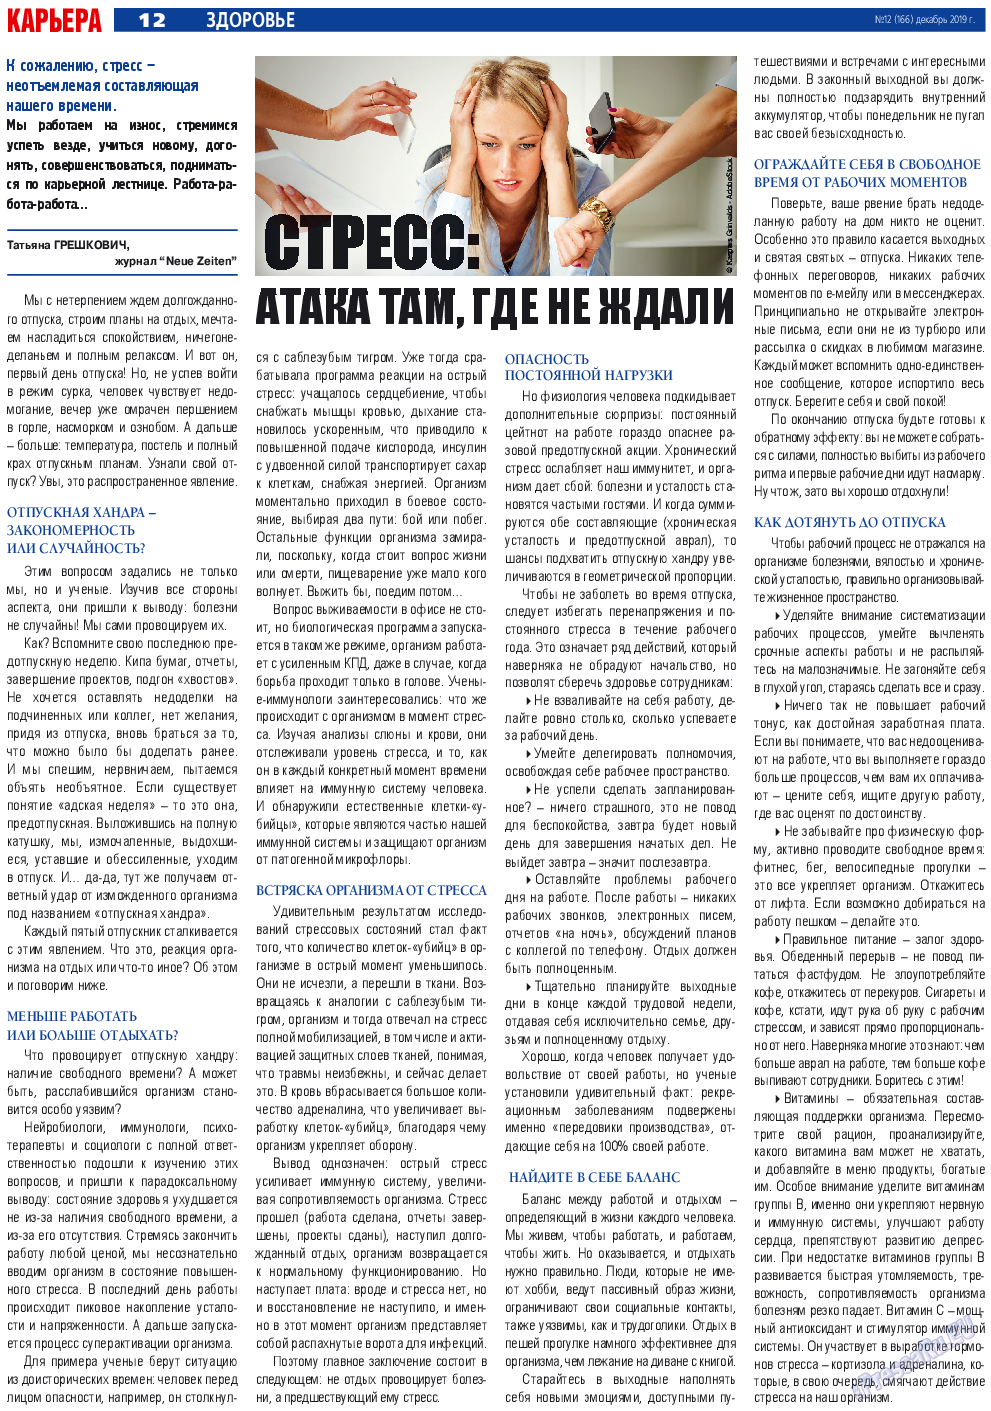 Карьера (газета). 2019 год, номер 12, стр. 12